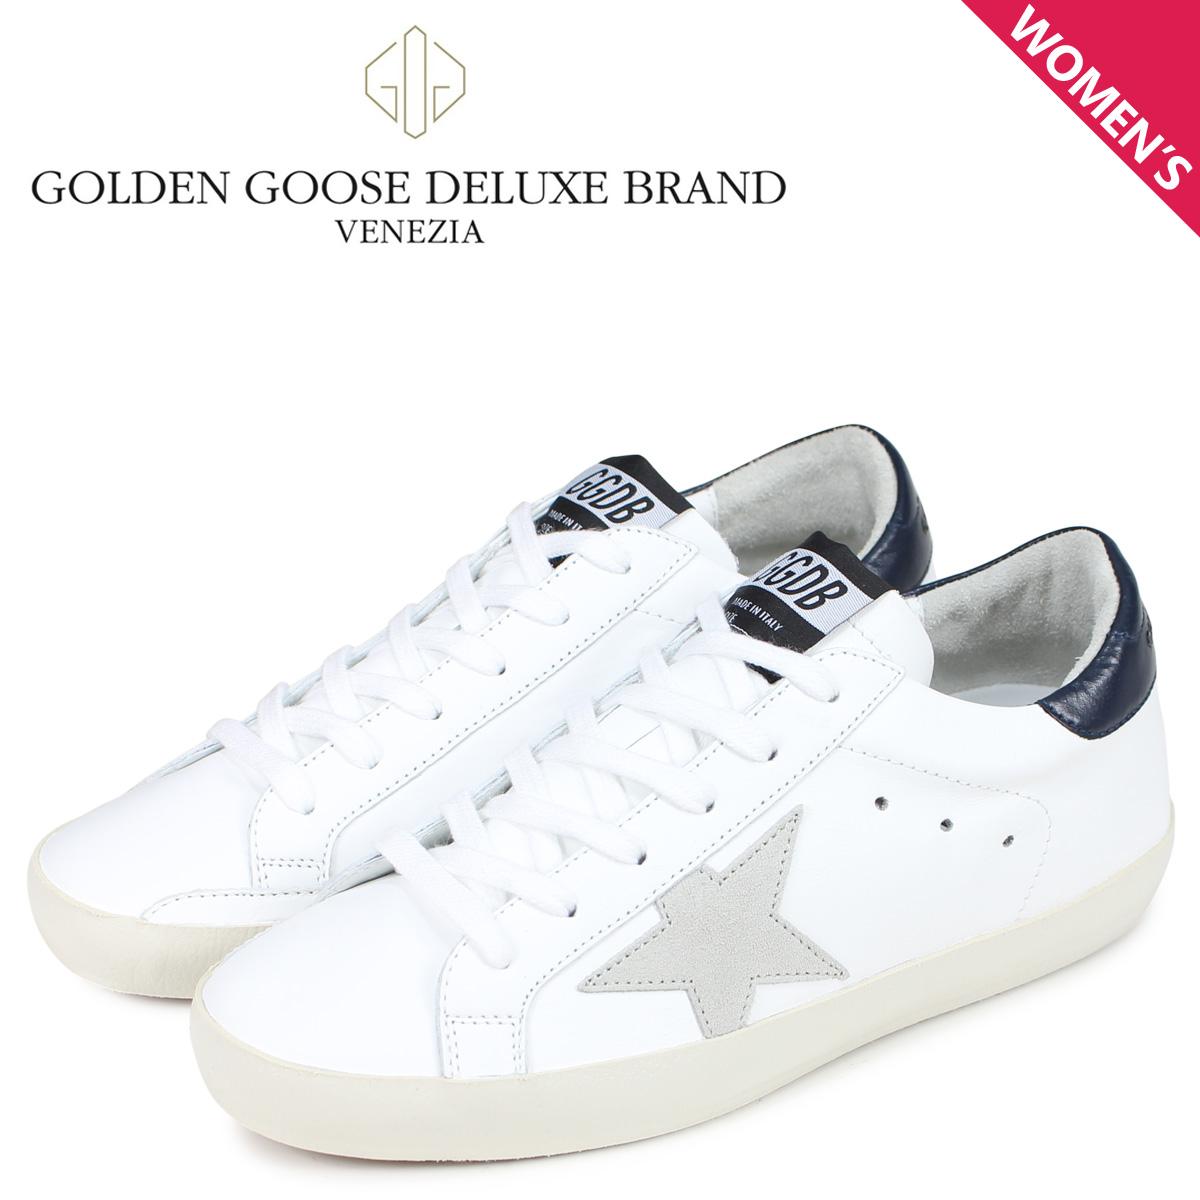 Golden Goose ゴールデングース スニーカー スーパースター レディース SNEAKERS SUPERSTAR ホワイト 白 G34WS590 L65 [3/4 新入荷]